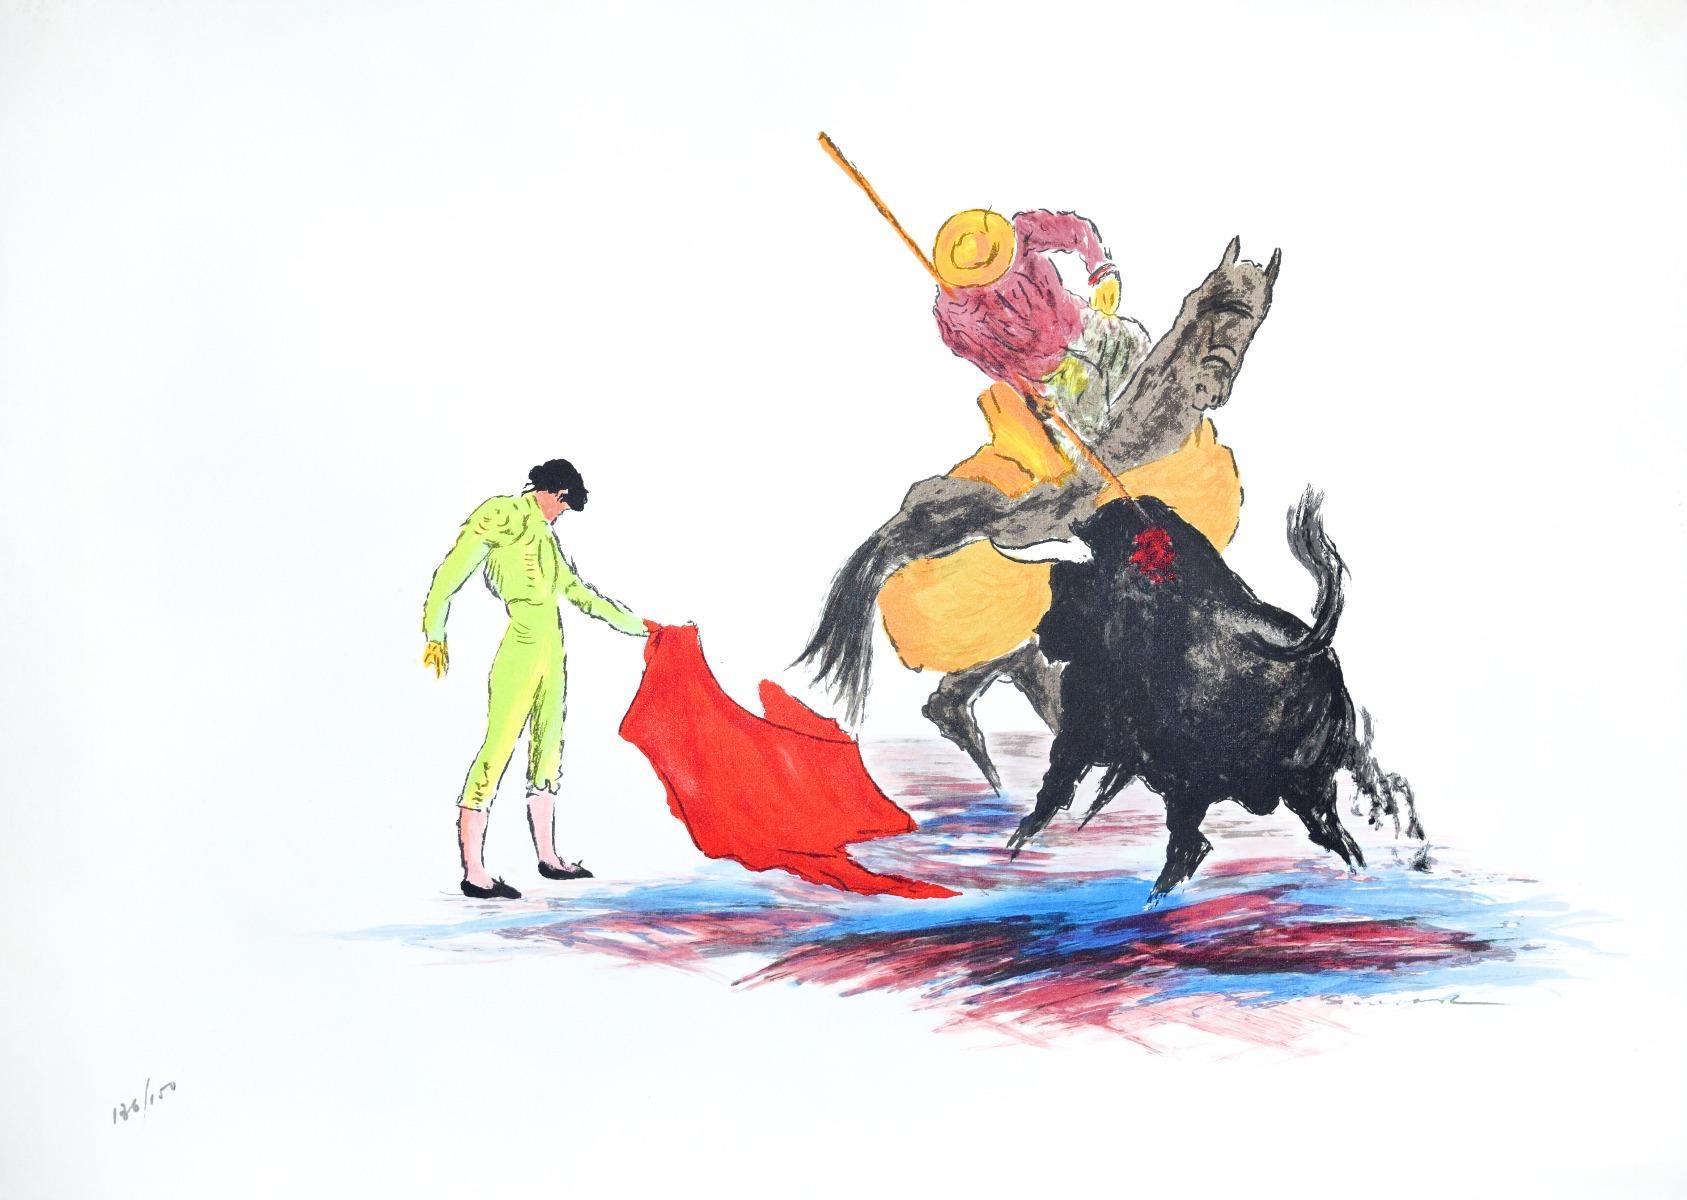 Bullfighter - Original Lithograph by José Guevara - 1990s